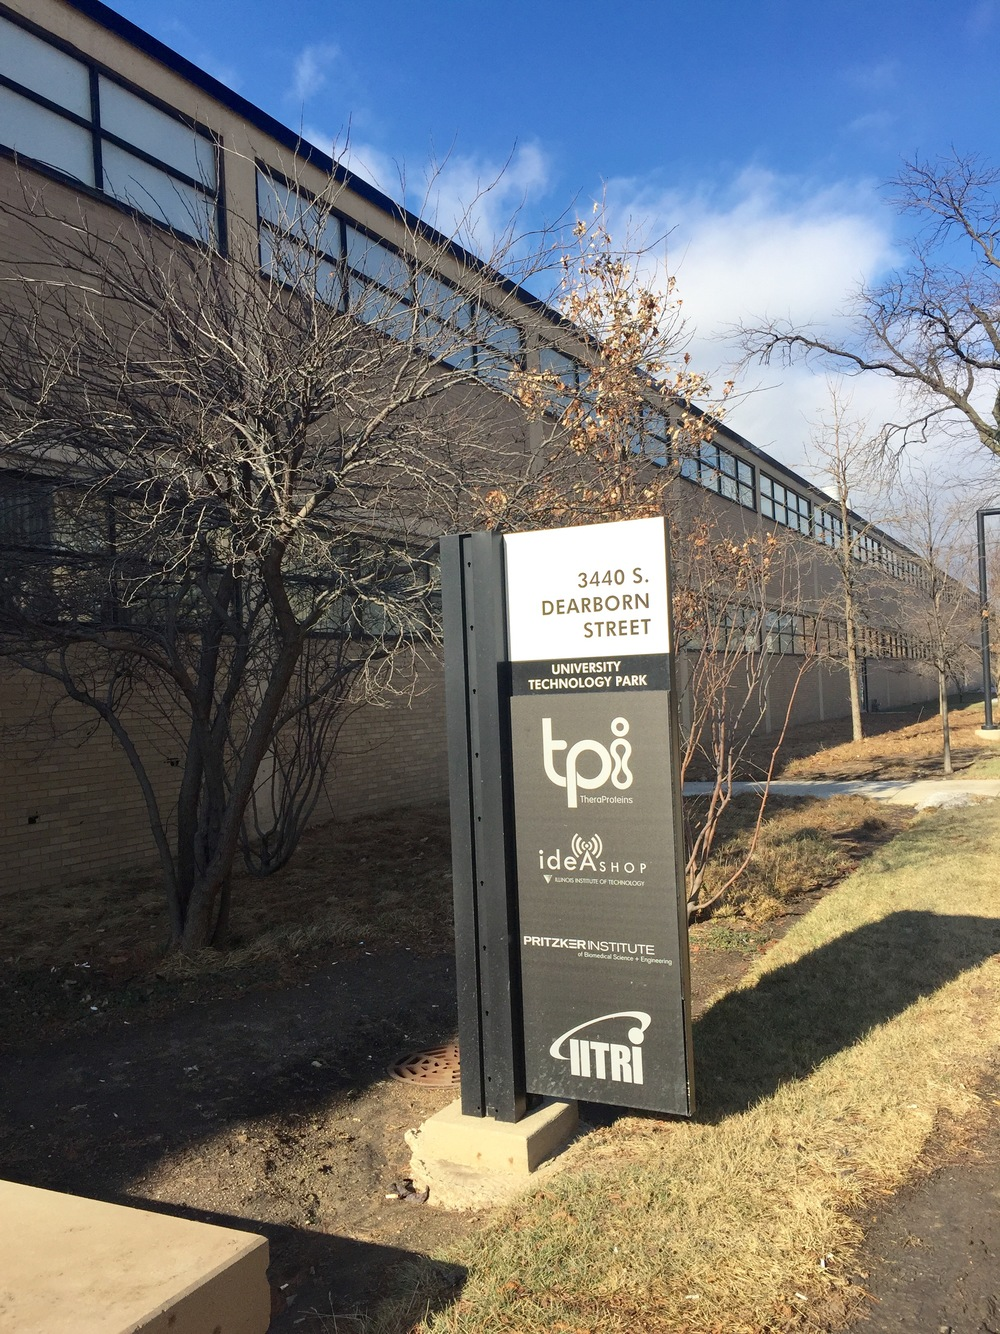 IIT Incubator Laboratory - Chicago, IL